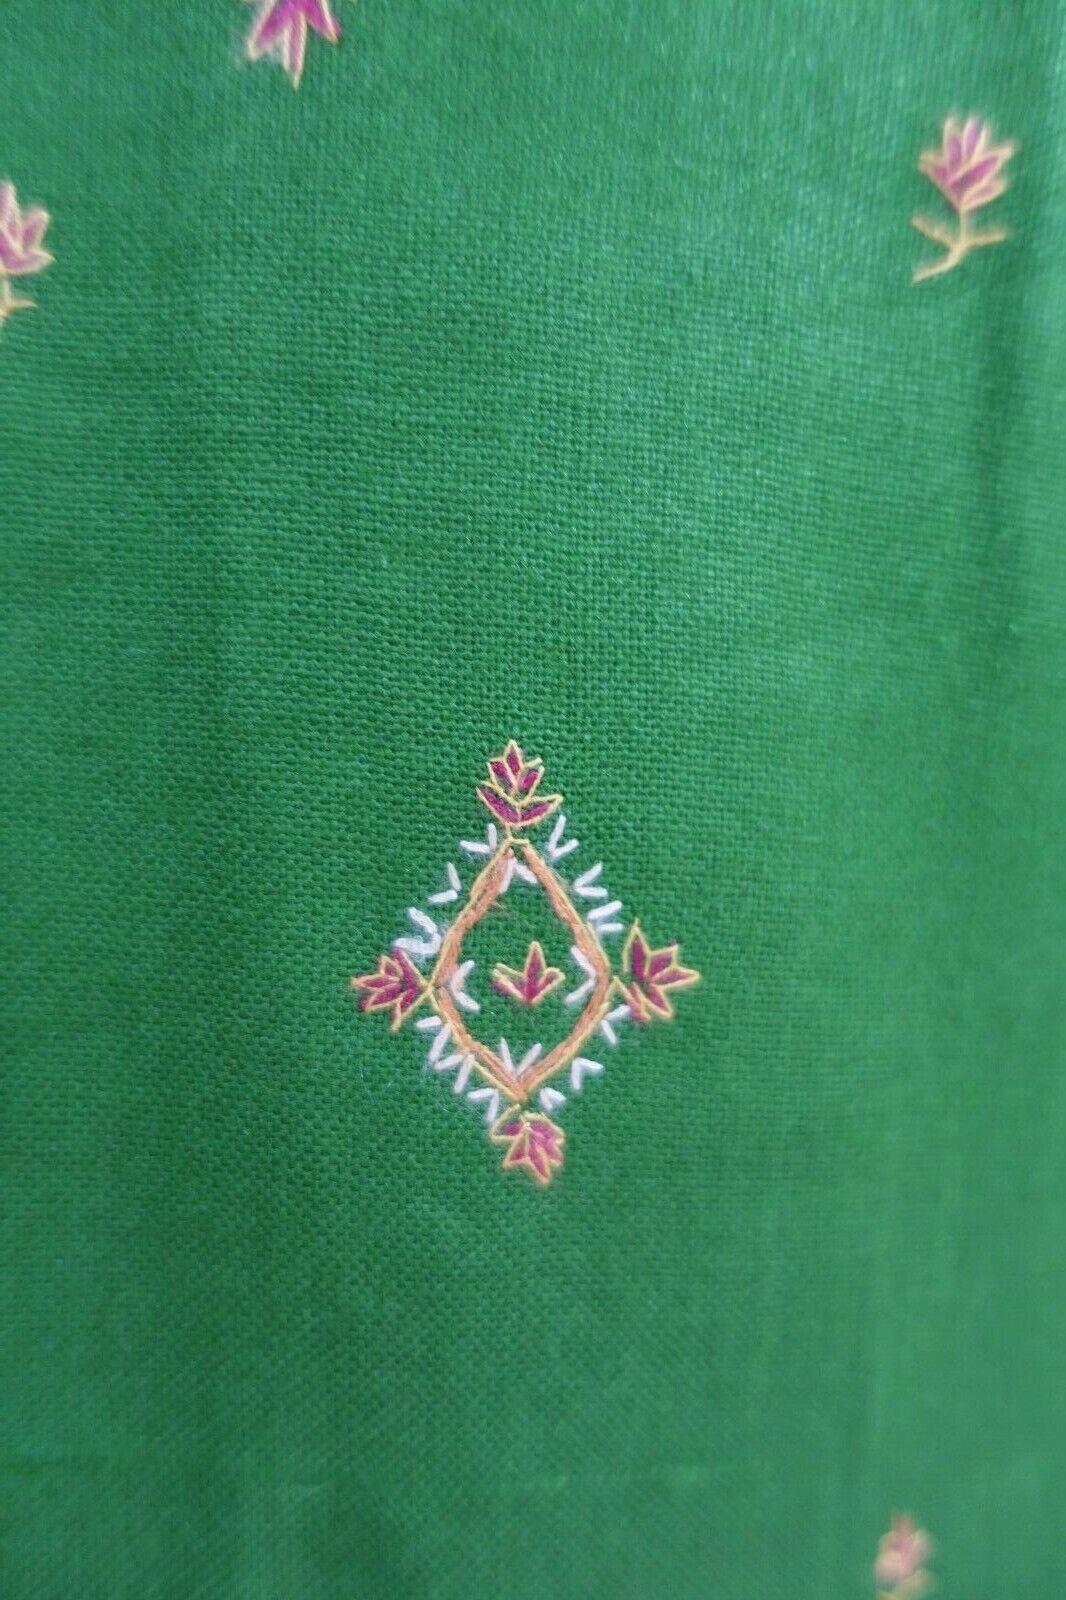 Green wool blend Kashmiri parsi Tunic kameez dress UK 12 / EU 38 SKU16411